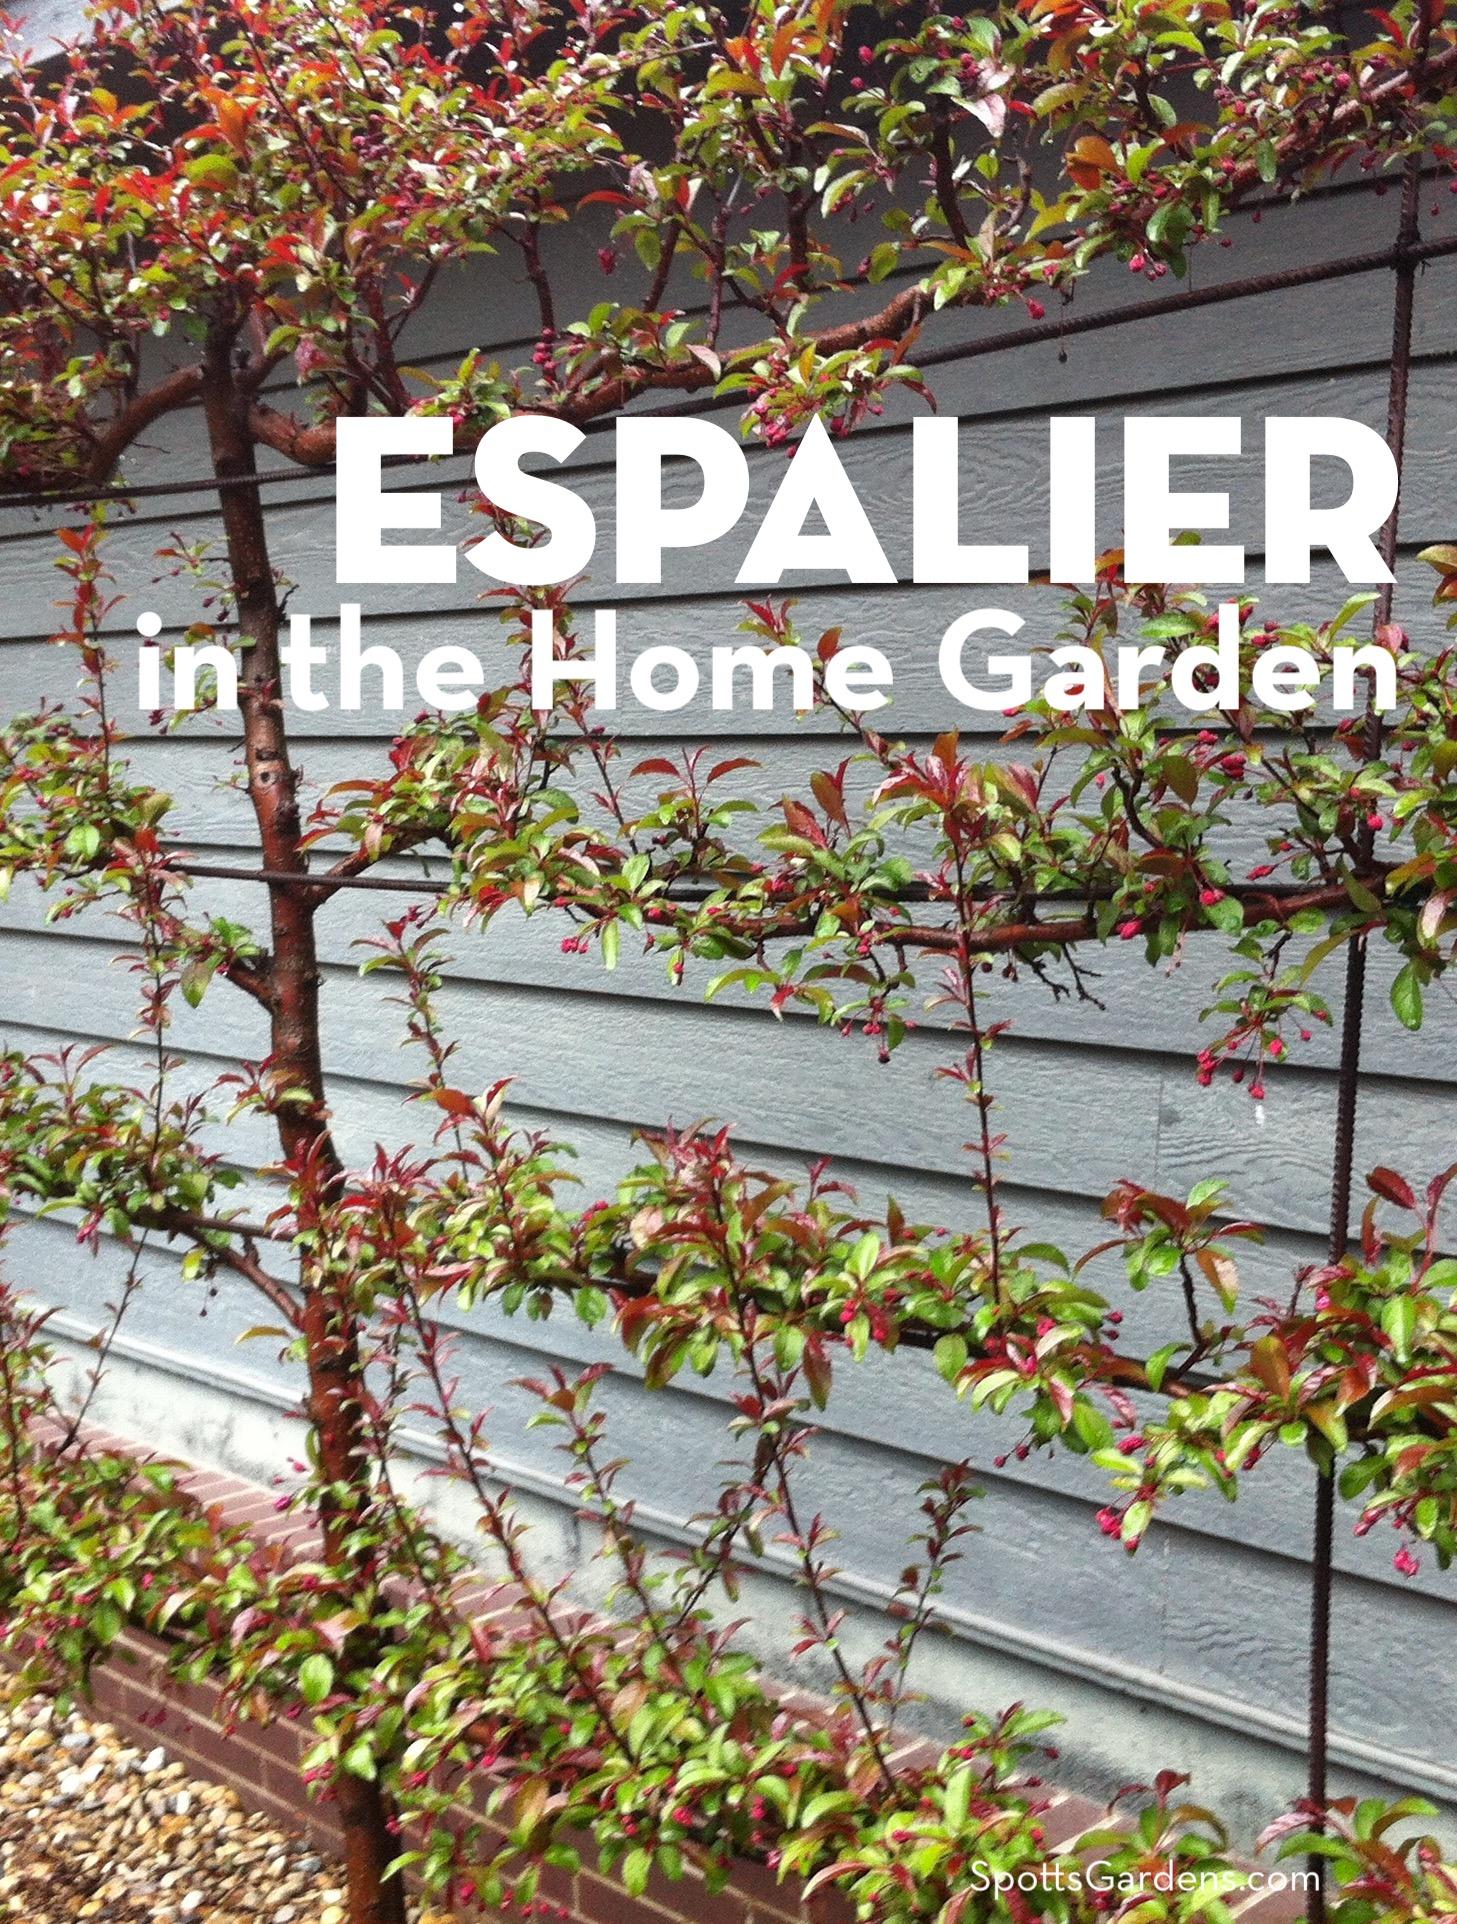 Espalier in the Home Garden